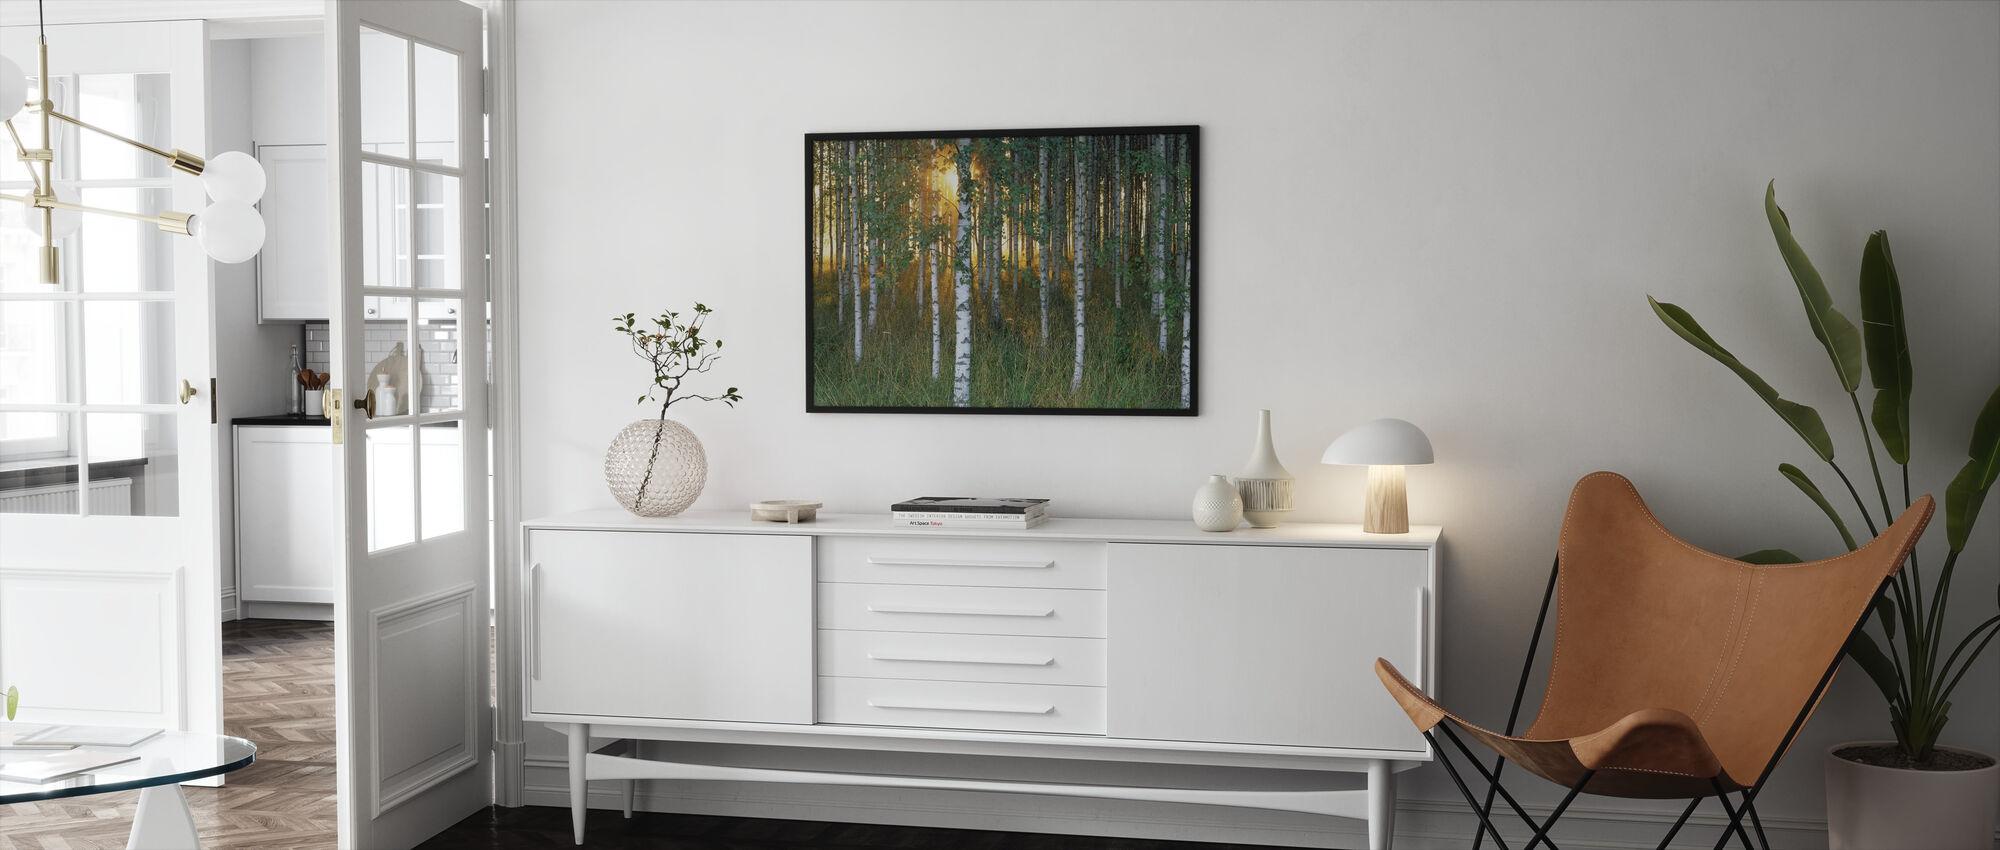 Sunbeam through Birch Forest - Framed print - Living Room